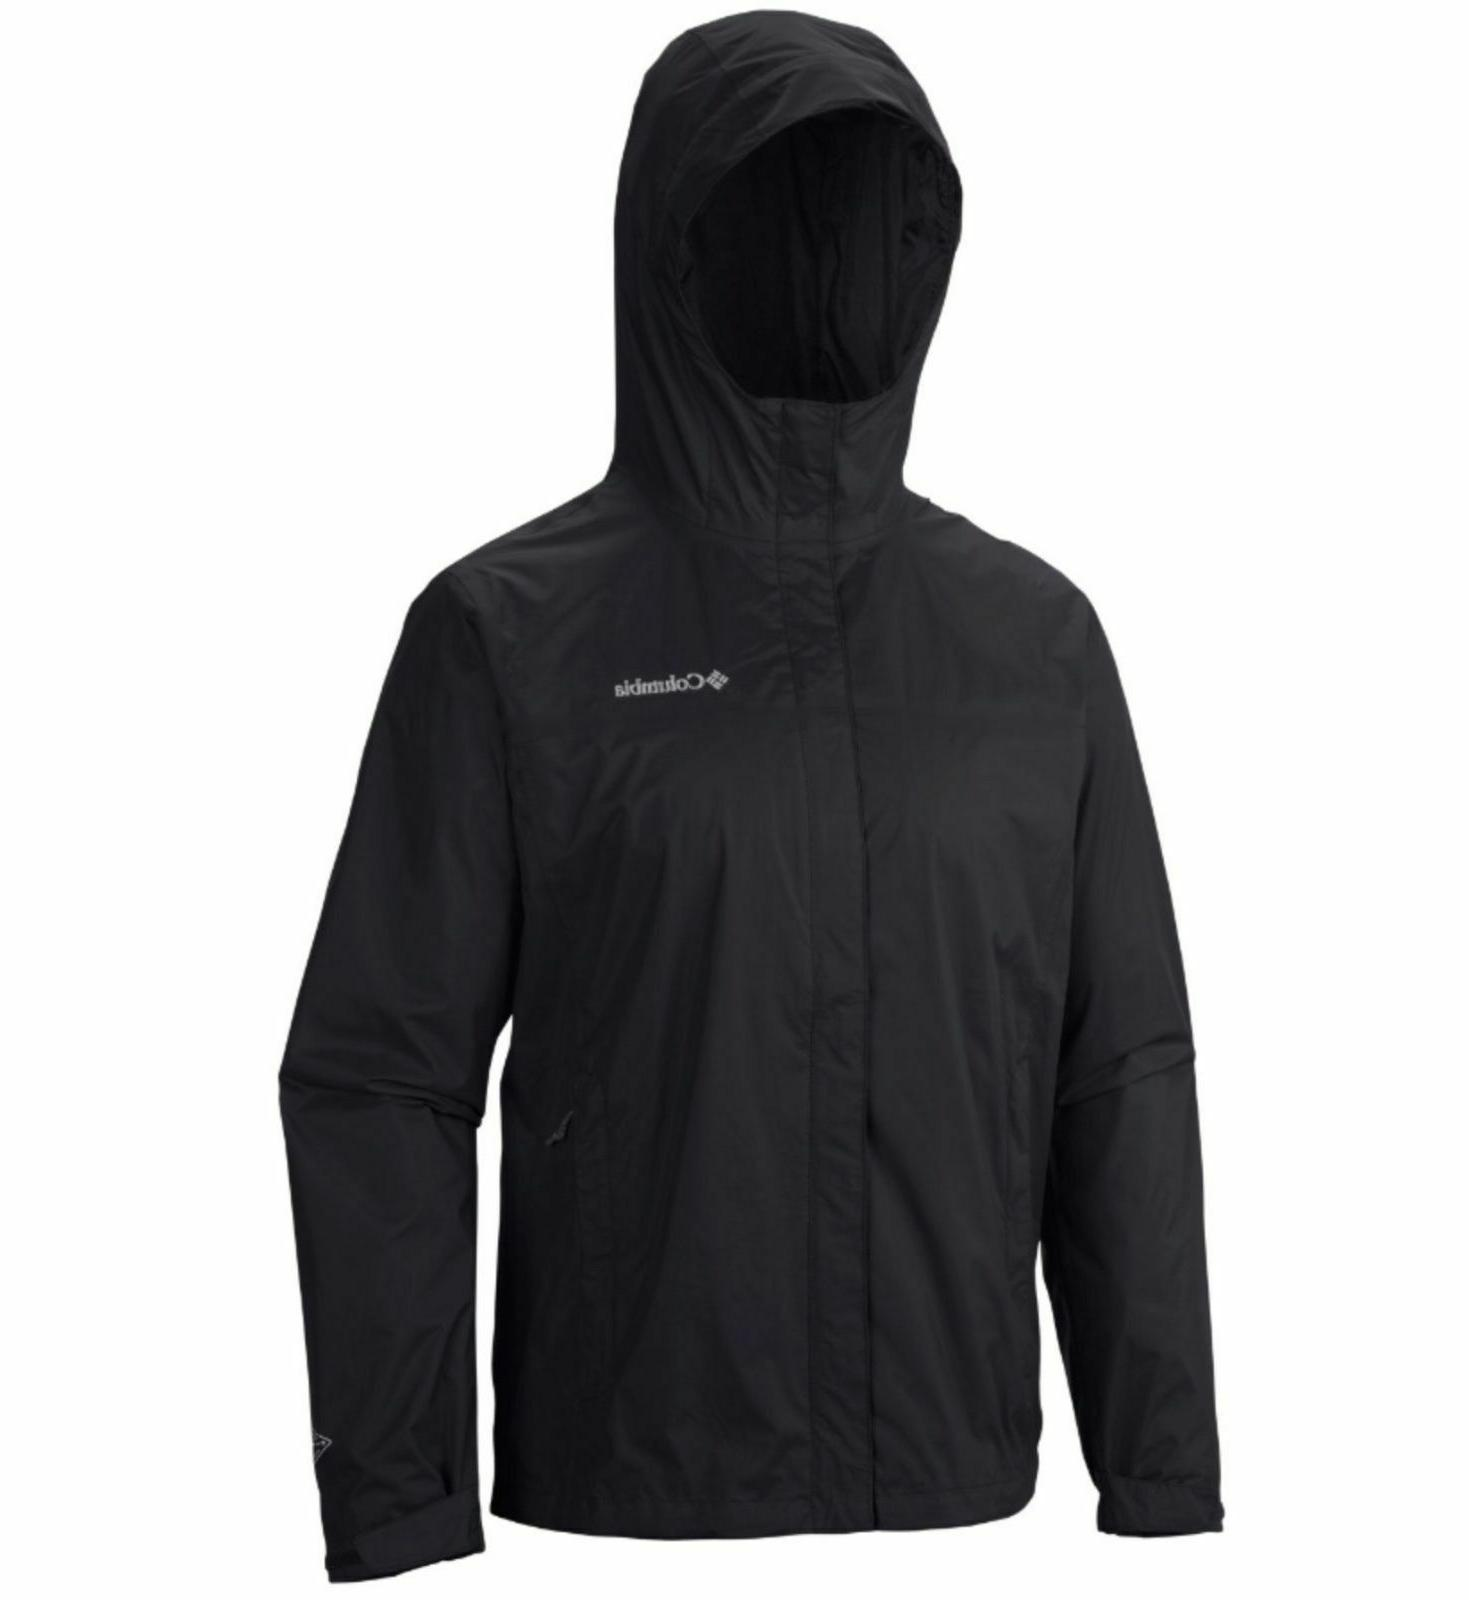 New $90 mens Timber Pointe waterproof hooded rain jacket Tall